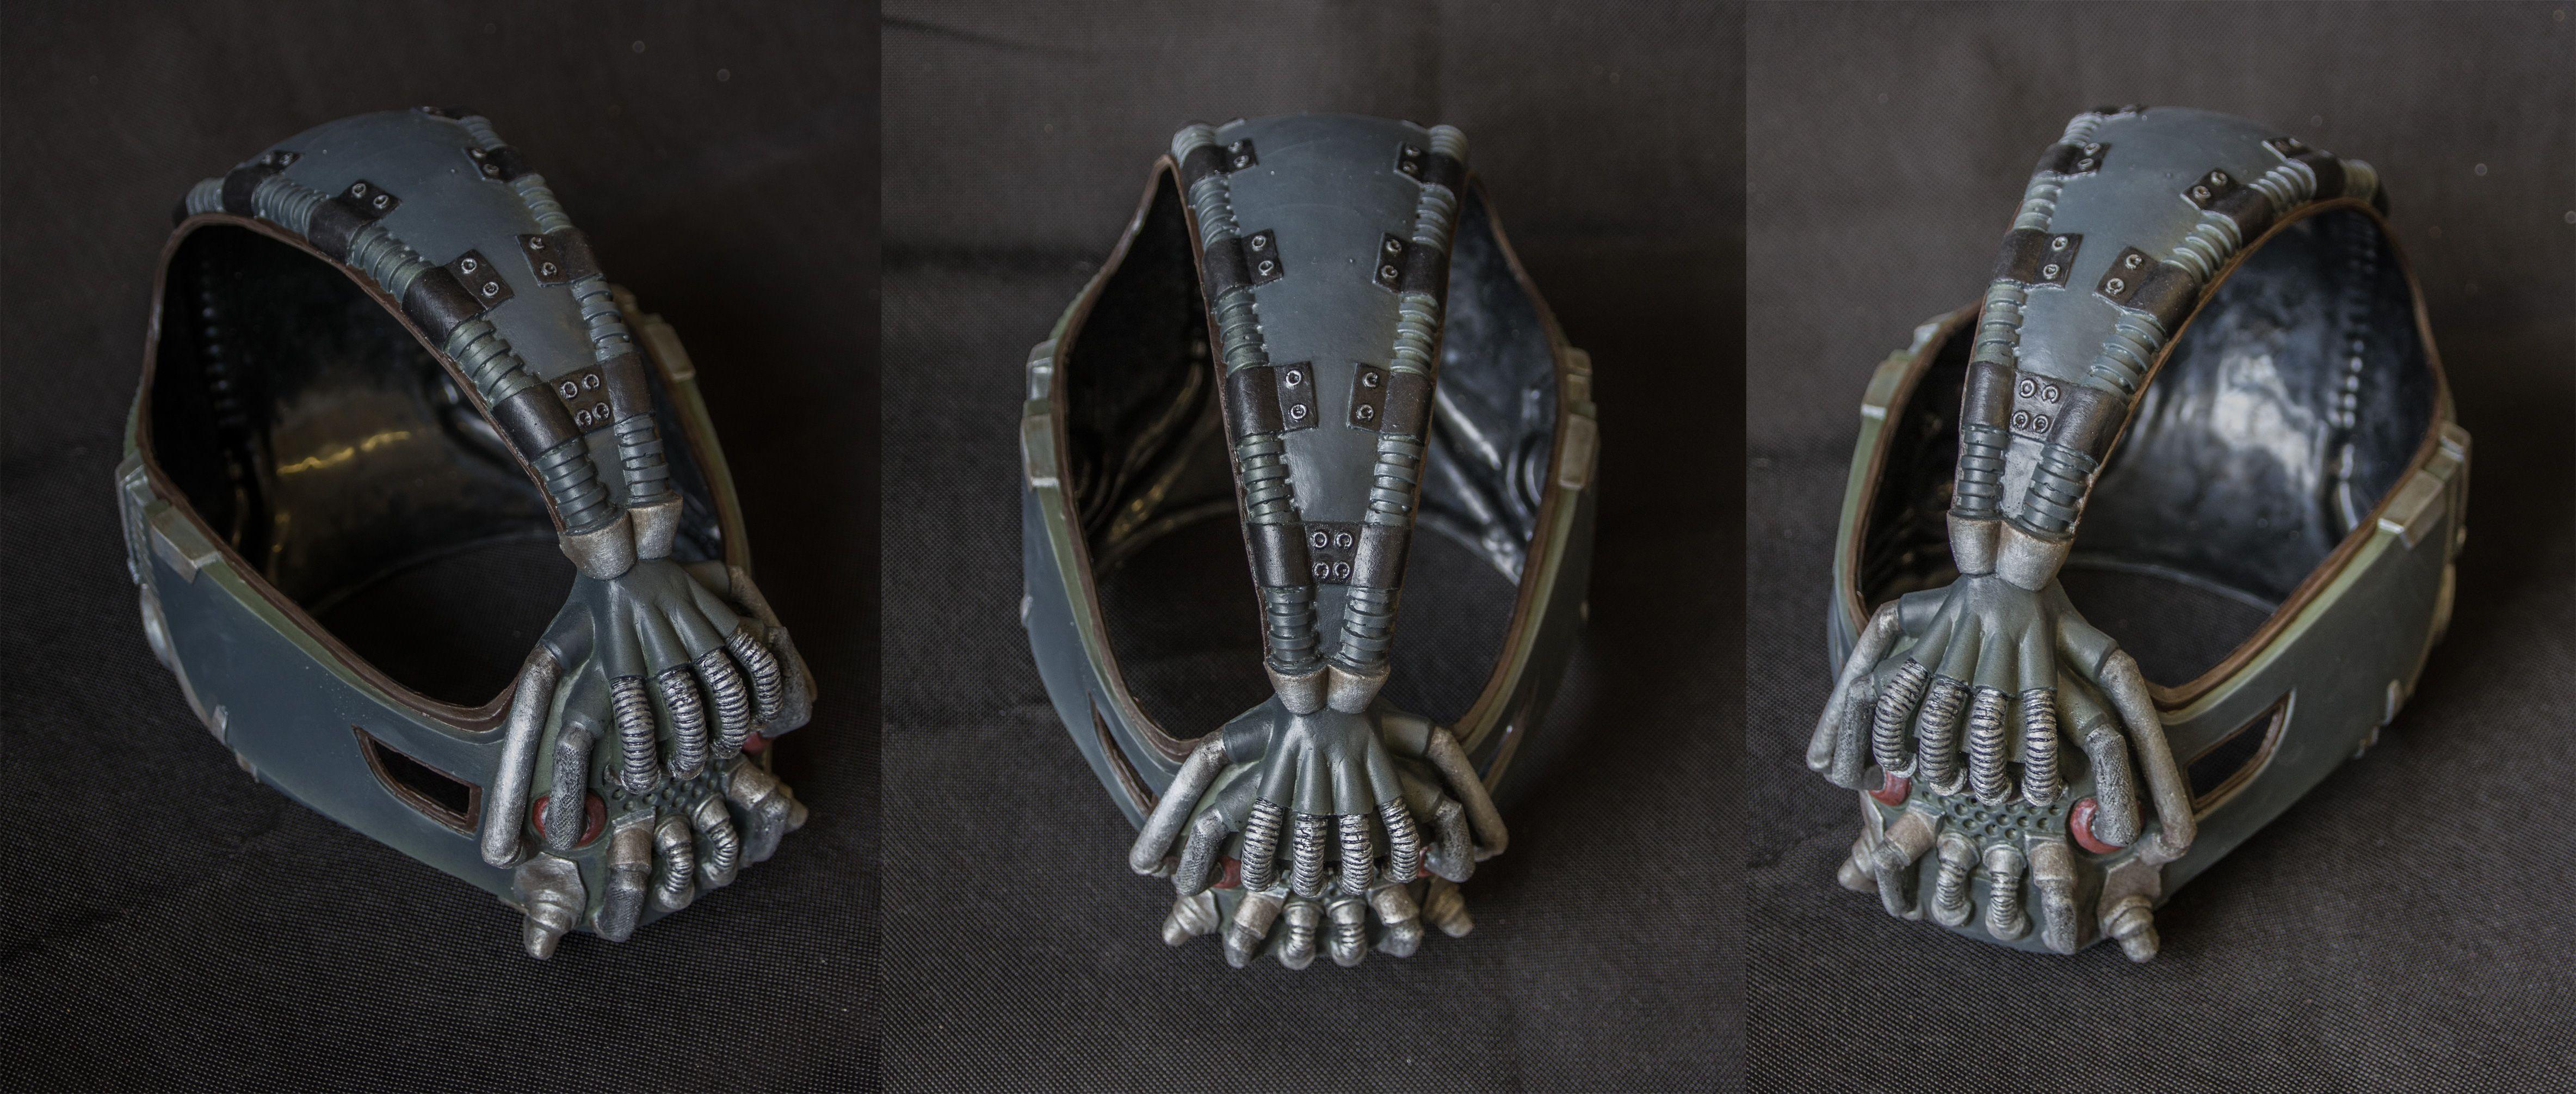 Bane mask replica | Bane mask replica | Pinterest